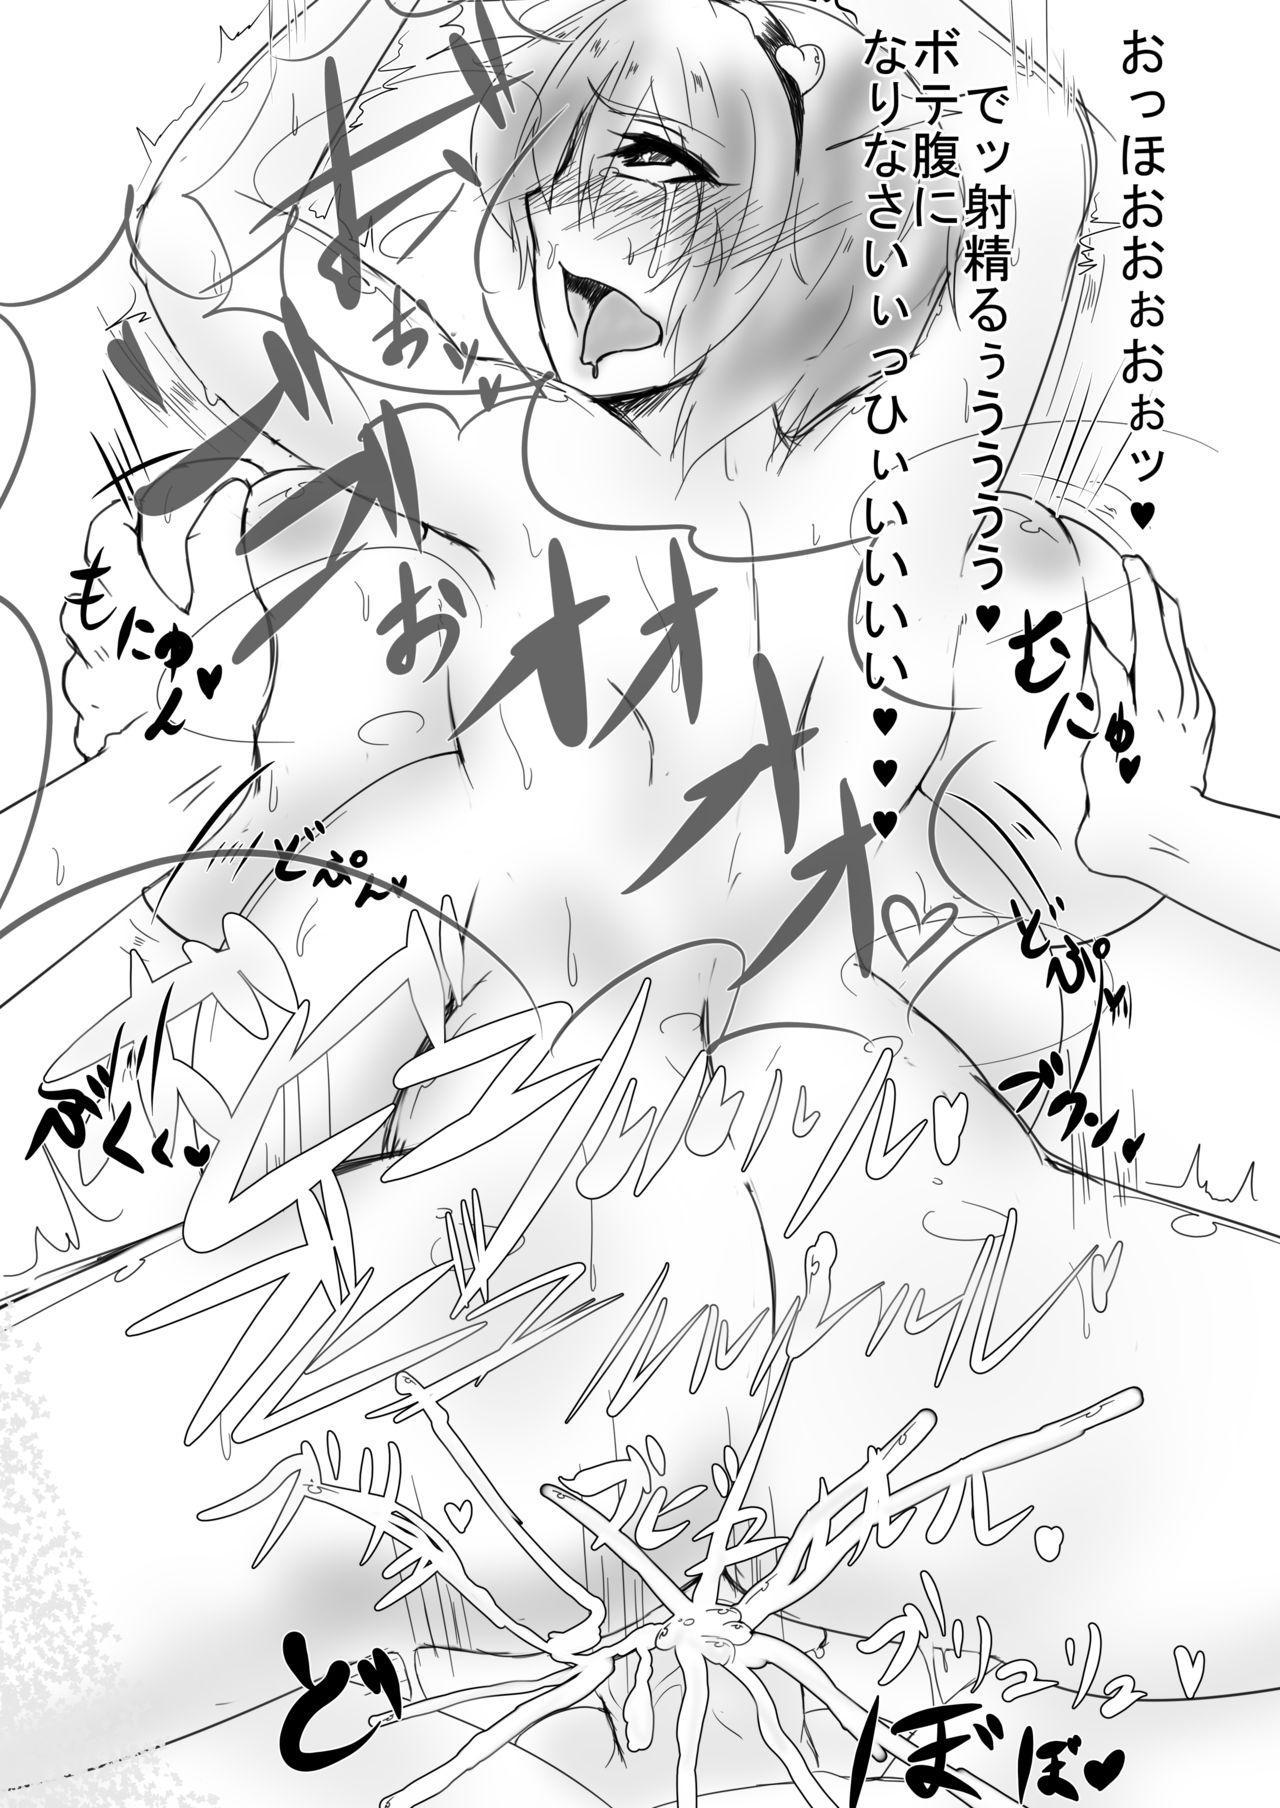 [Black_Sugar(Kari) (Kuroi Megane)] Touhou Futabusa ~Kazami Yuuka~ 2 (Touhou Project) [Digital] 8